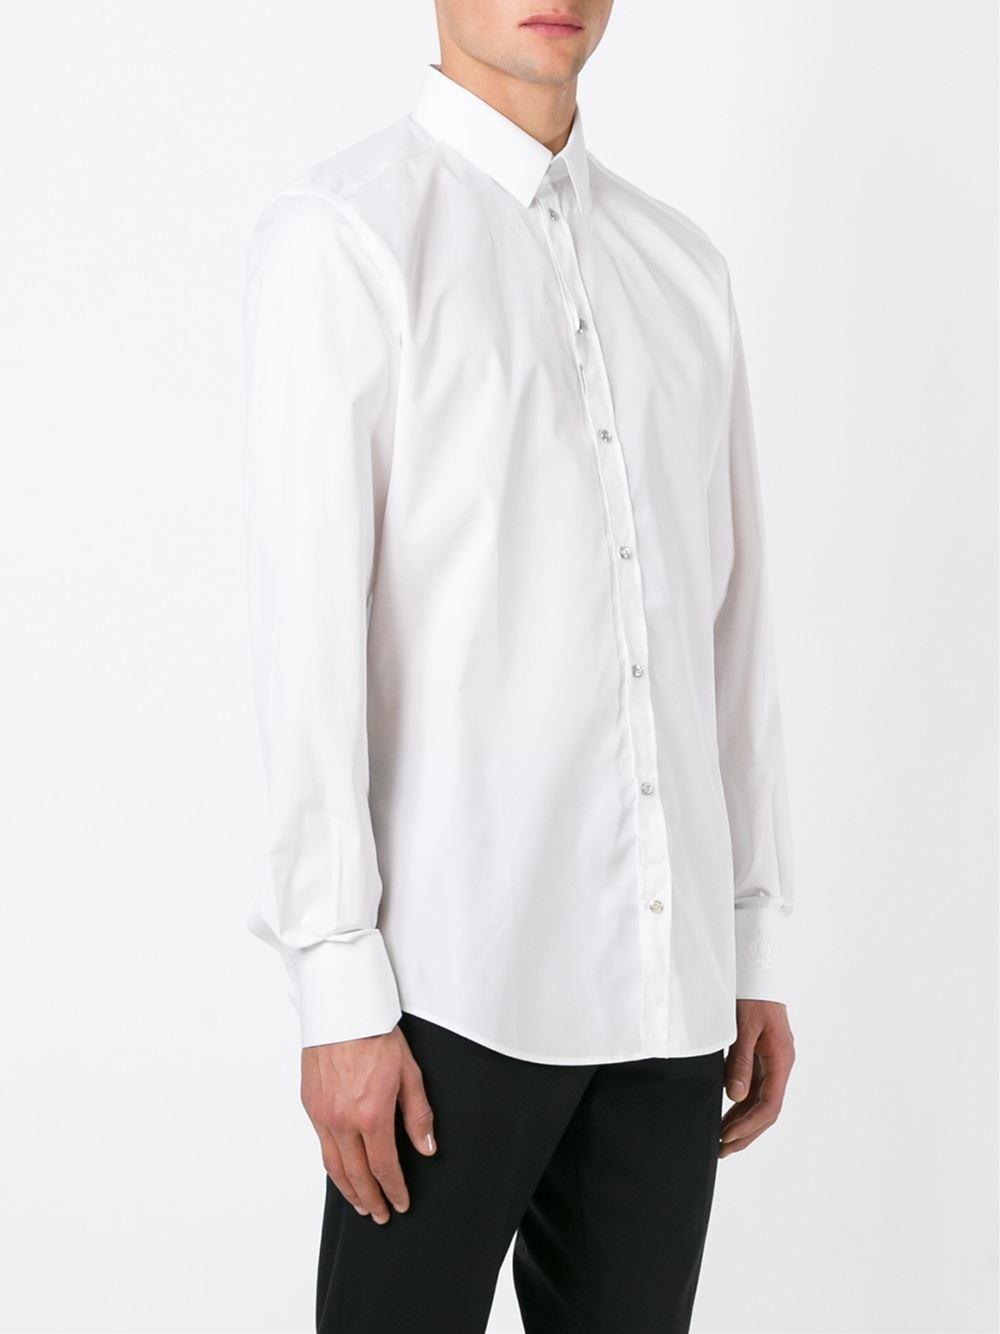 Dolce Gabbana Classic Shirt In White For Men Lyst